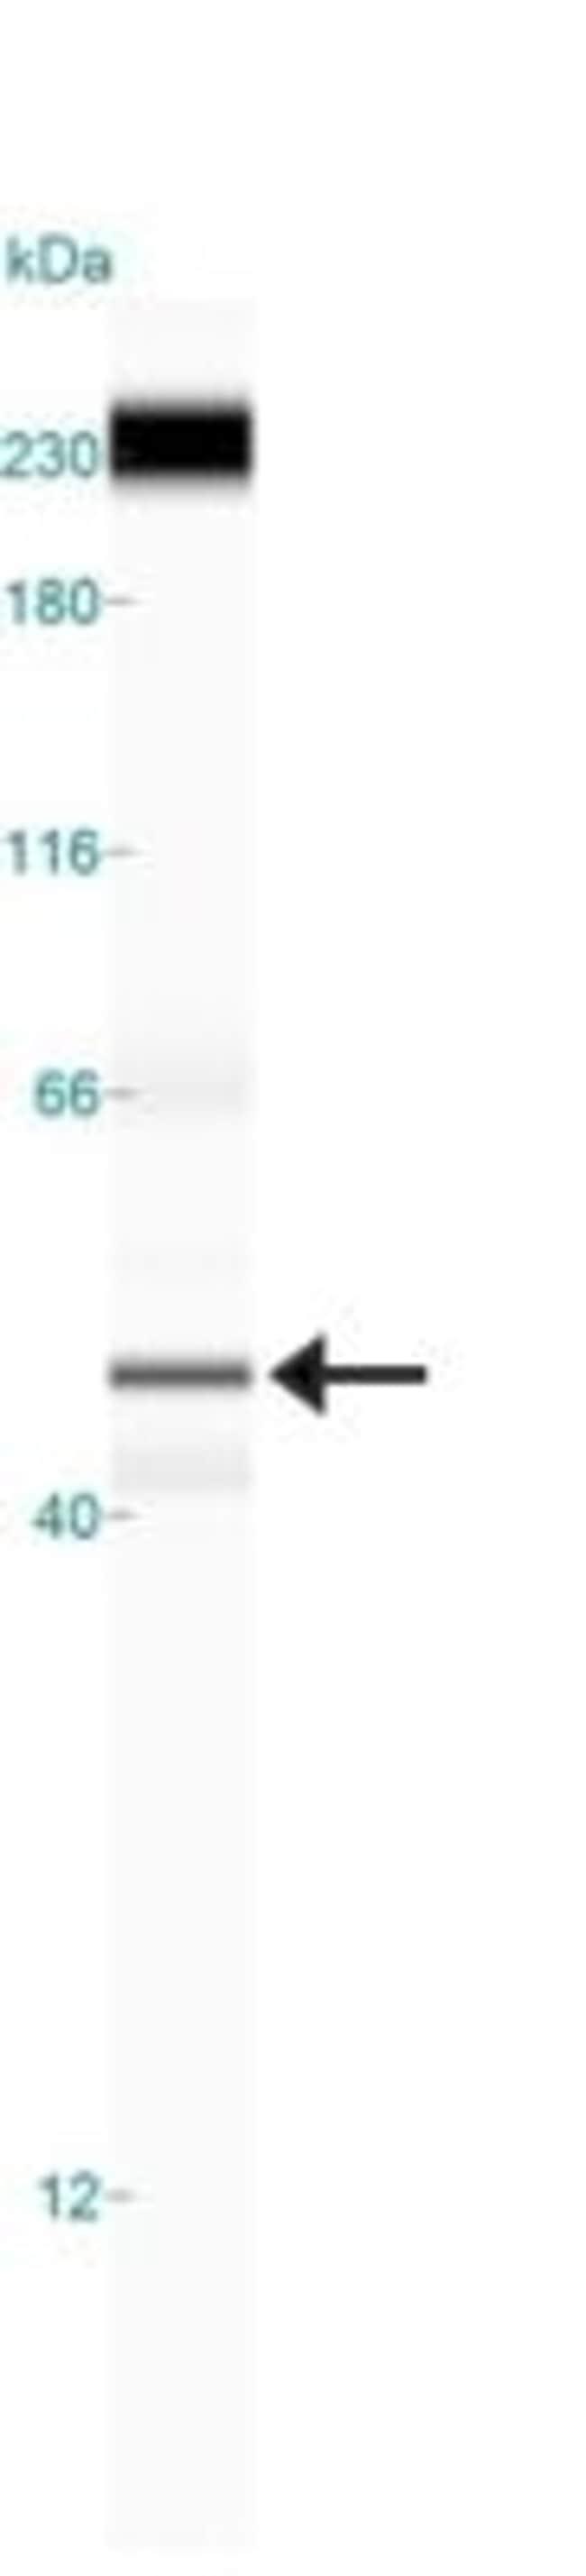 anti-p73, Polyclonal, Novus Biologicals:Antibodies:Primary Antibodies